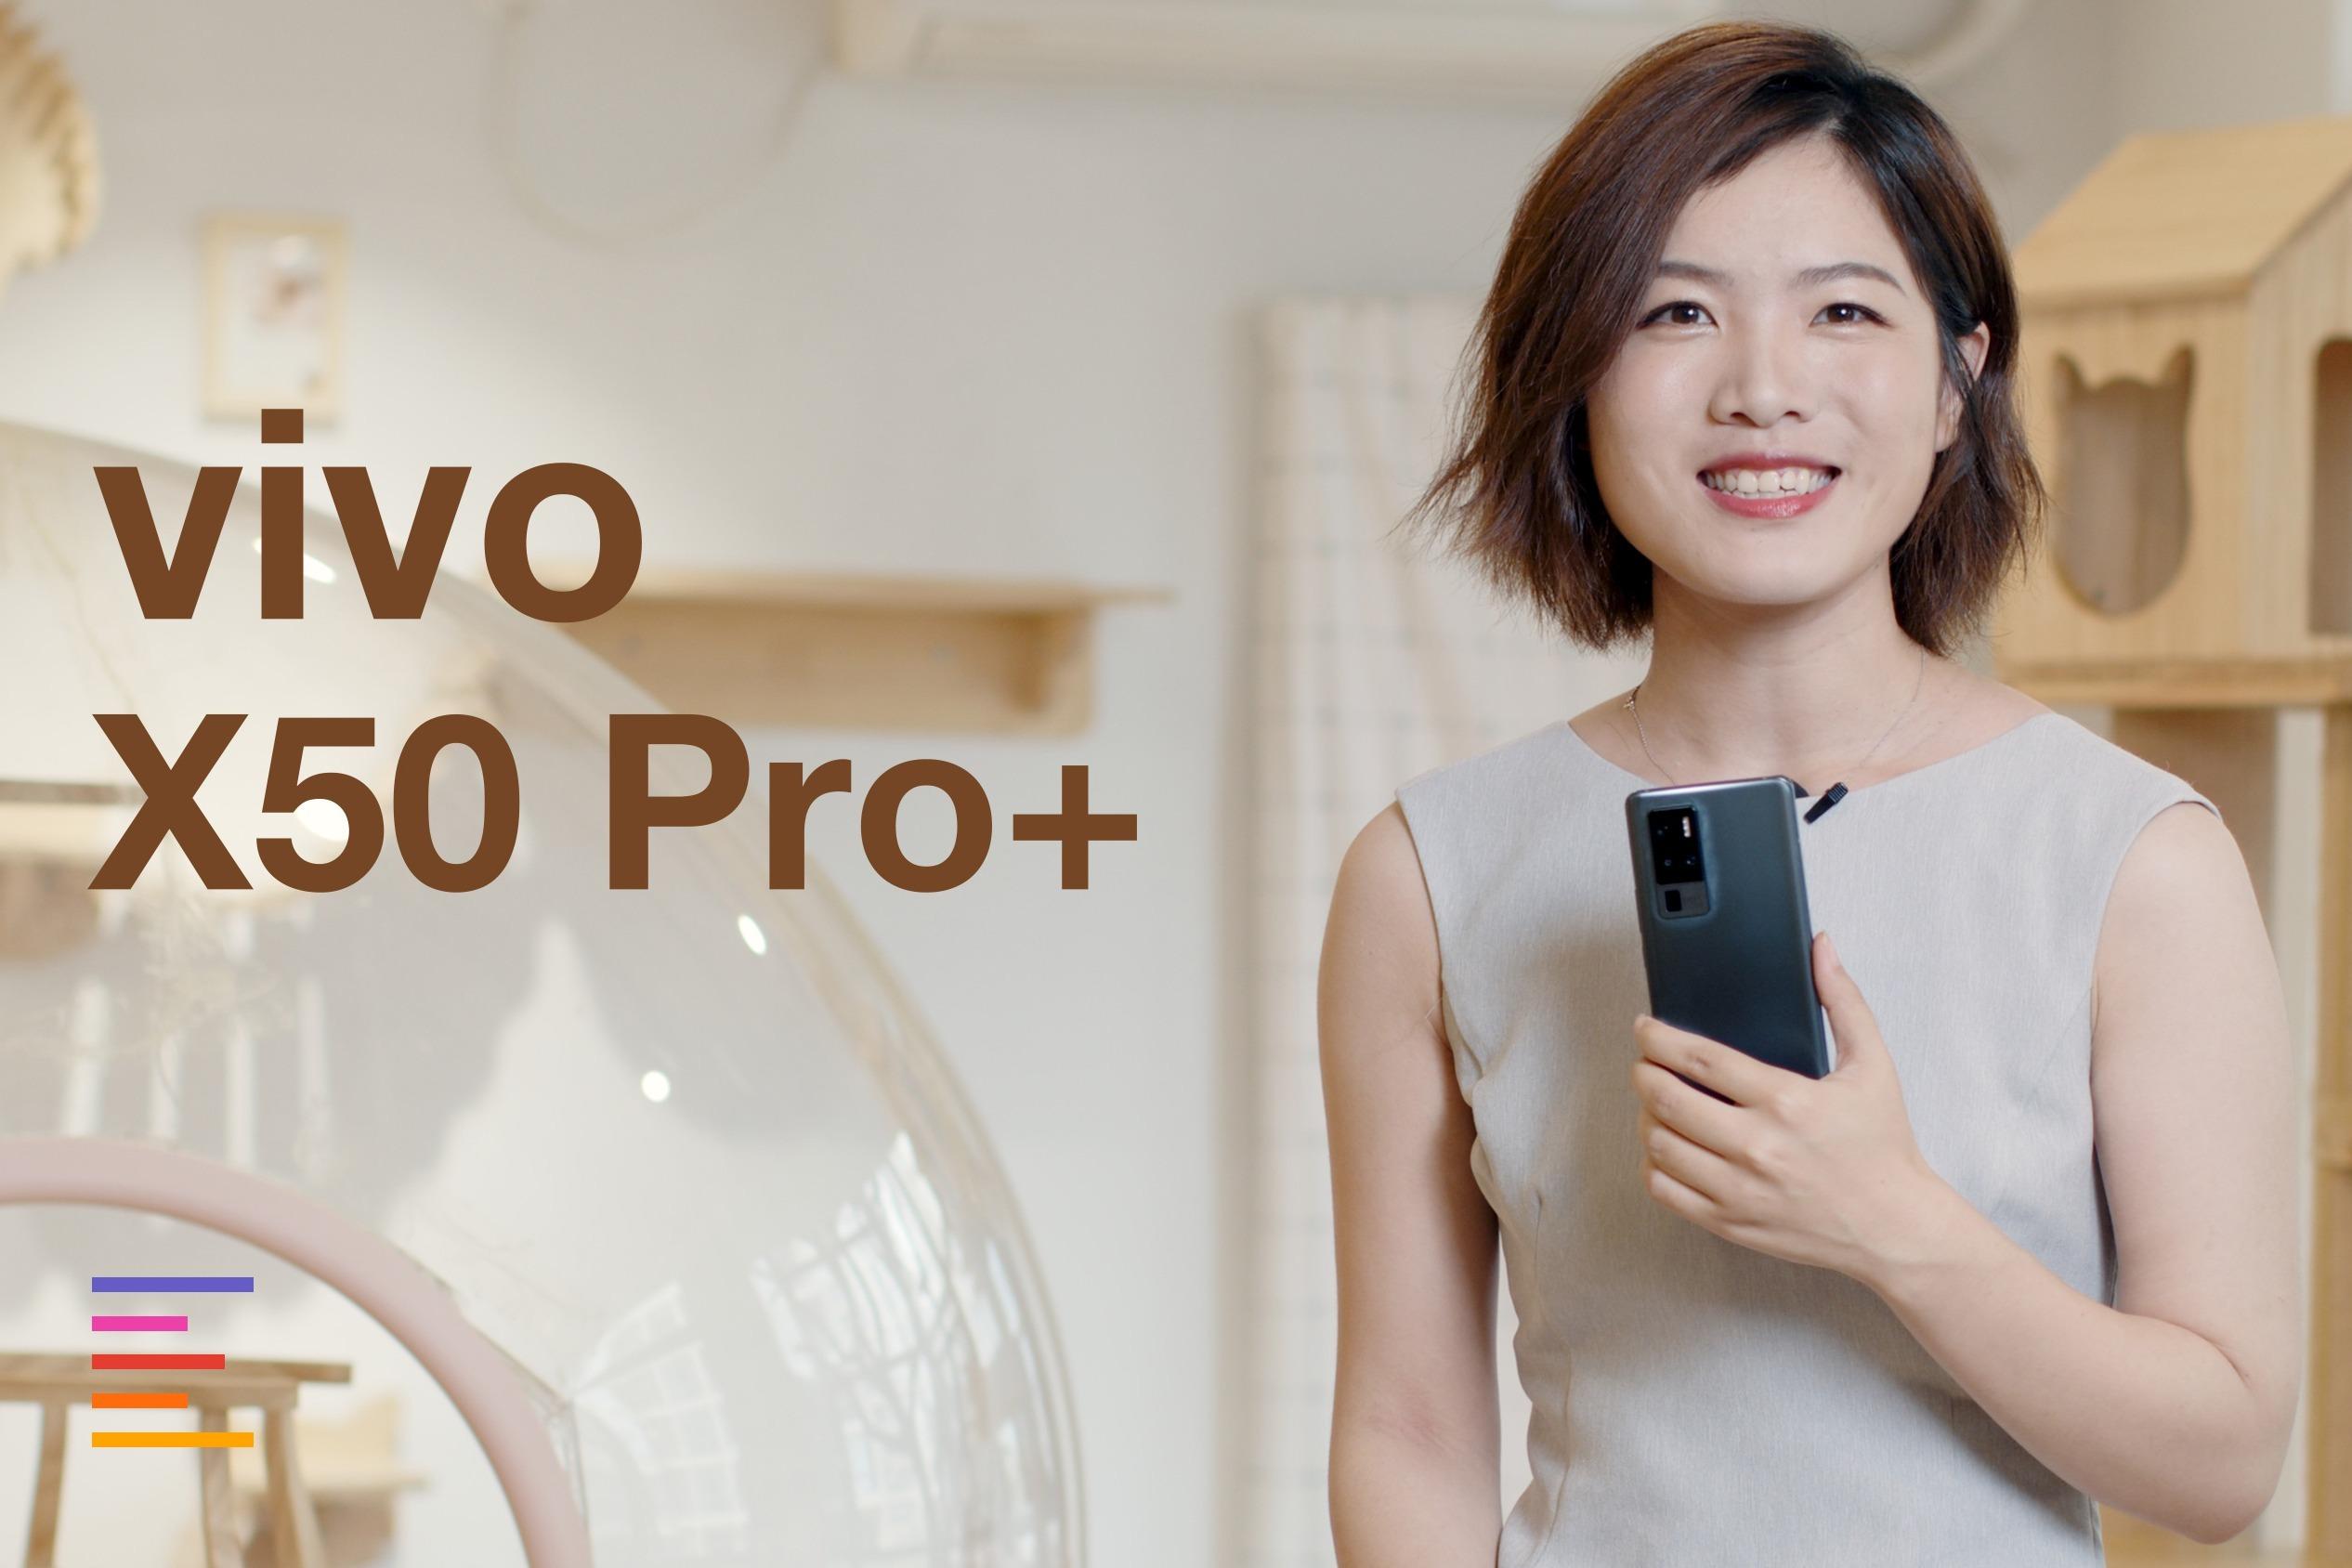 "vivo X50 Pro+ 体验:用超大杯拍""猫片""   凰家评测"